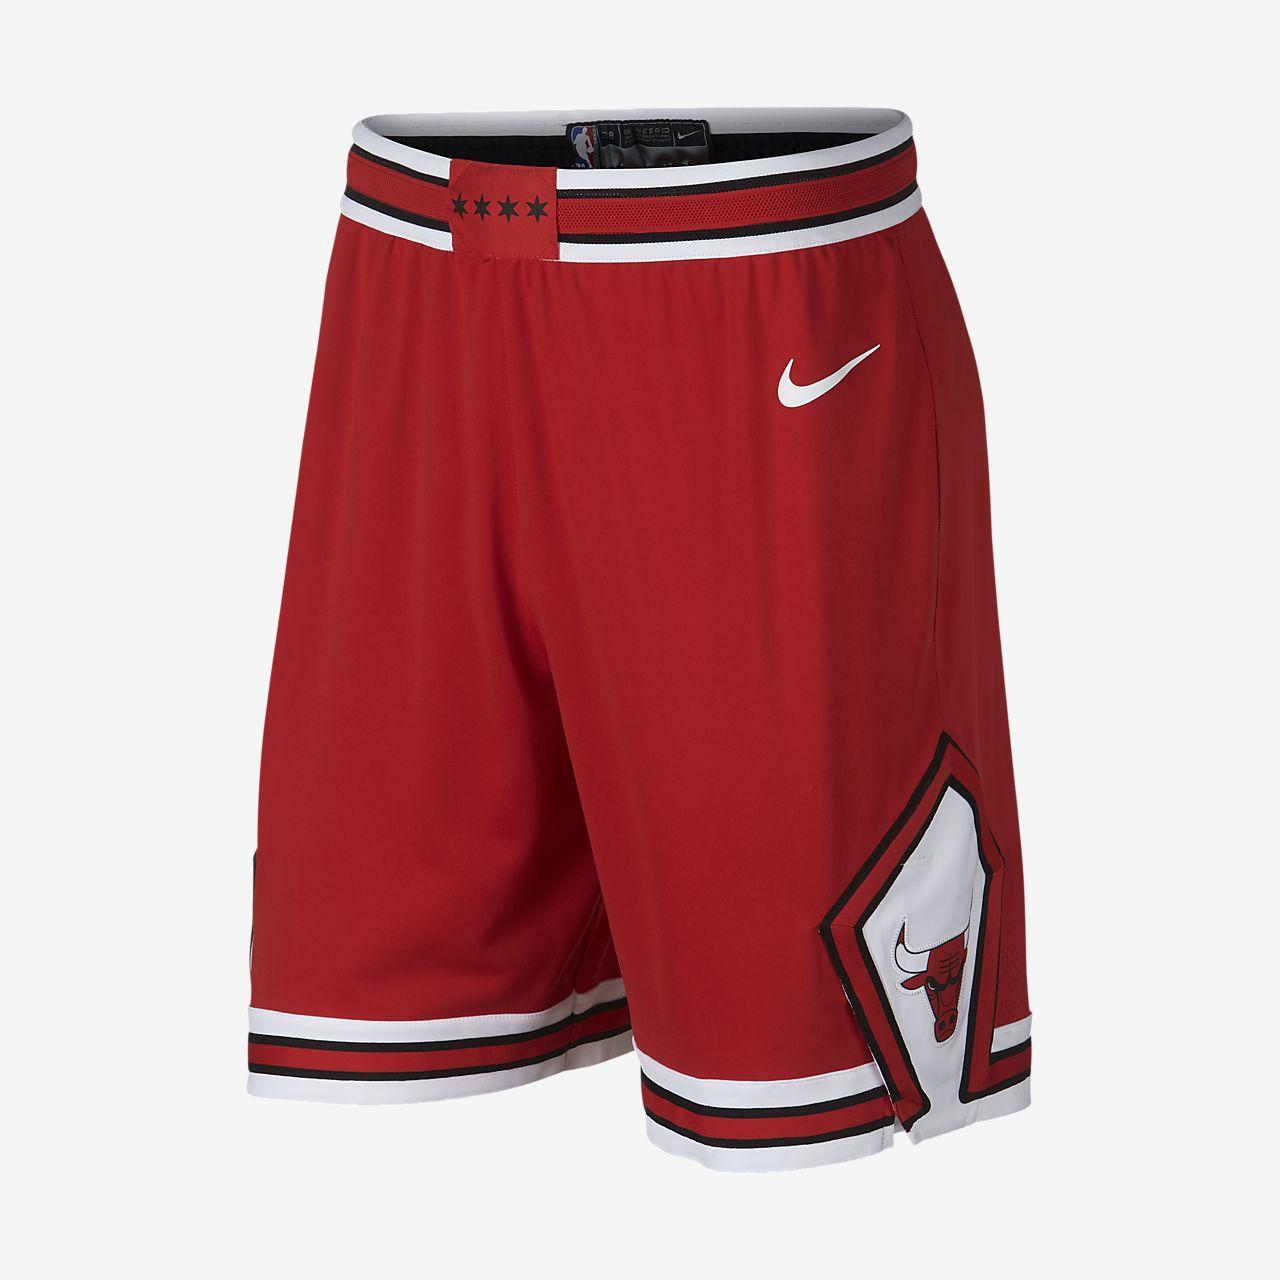 Shorts de NBA para hombre Chicago Bulls Nike Icon Edition Authentic ... ee574051b09